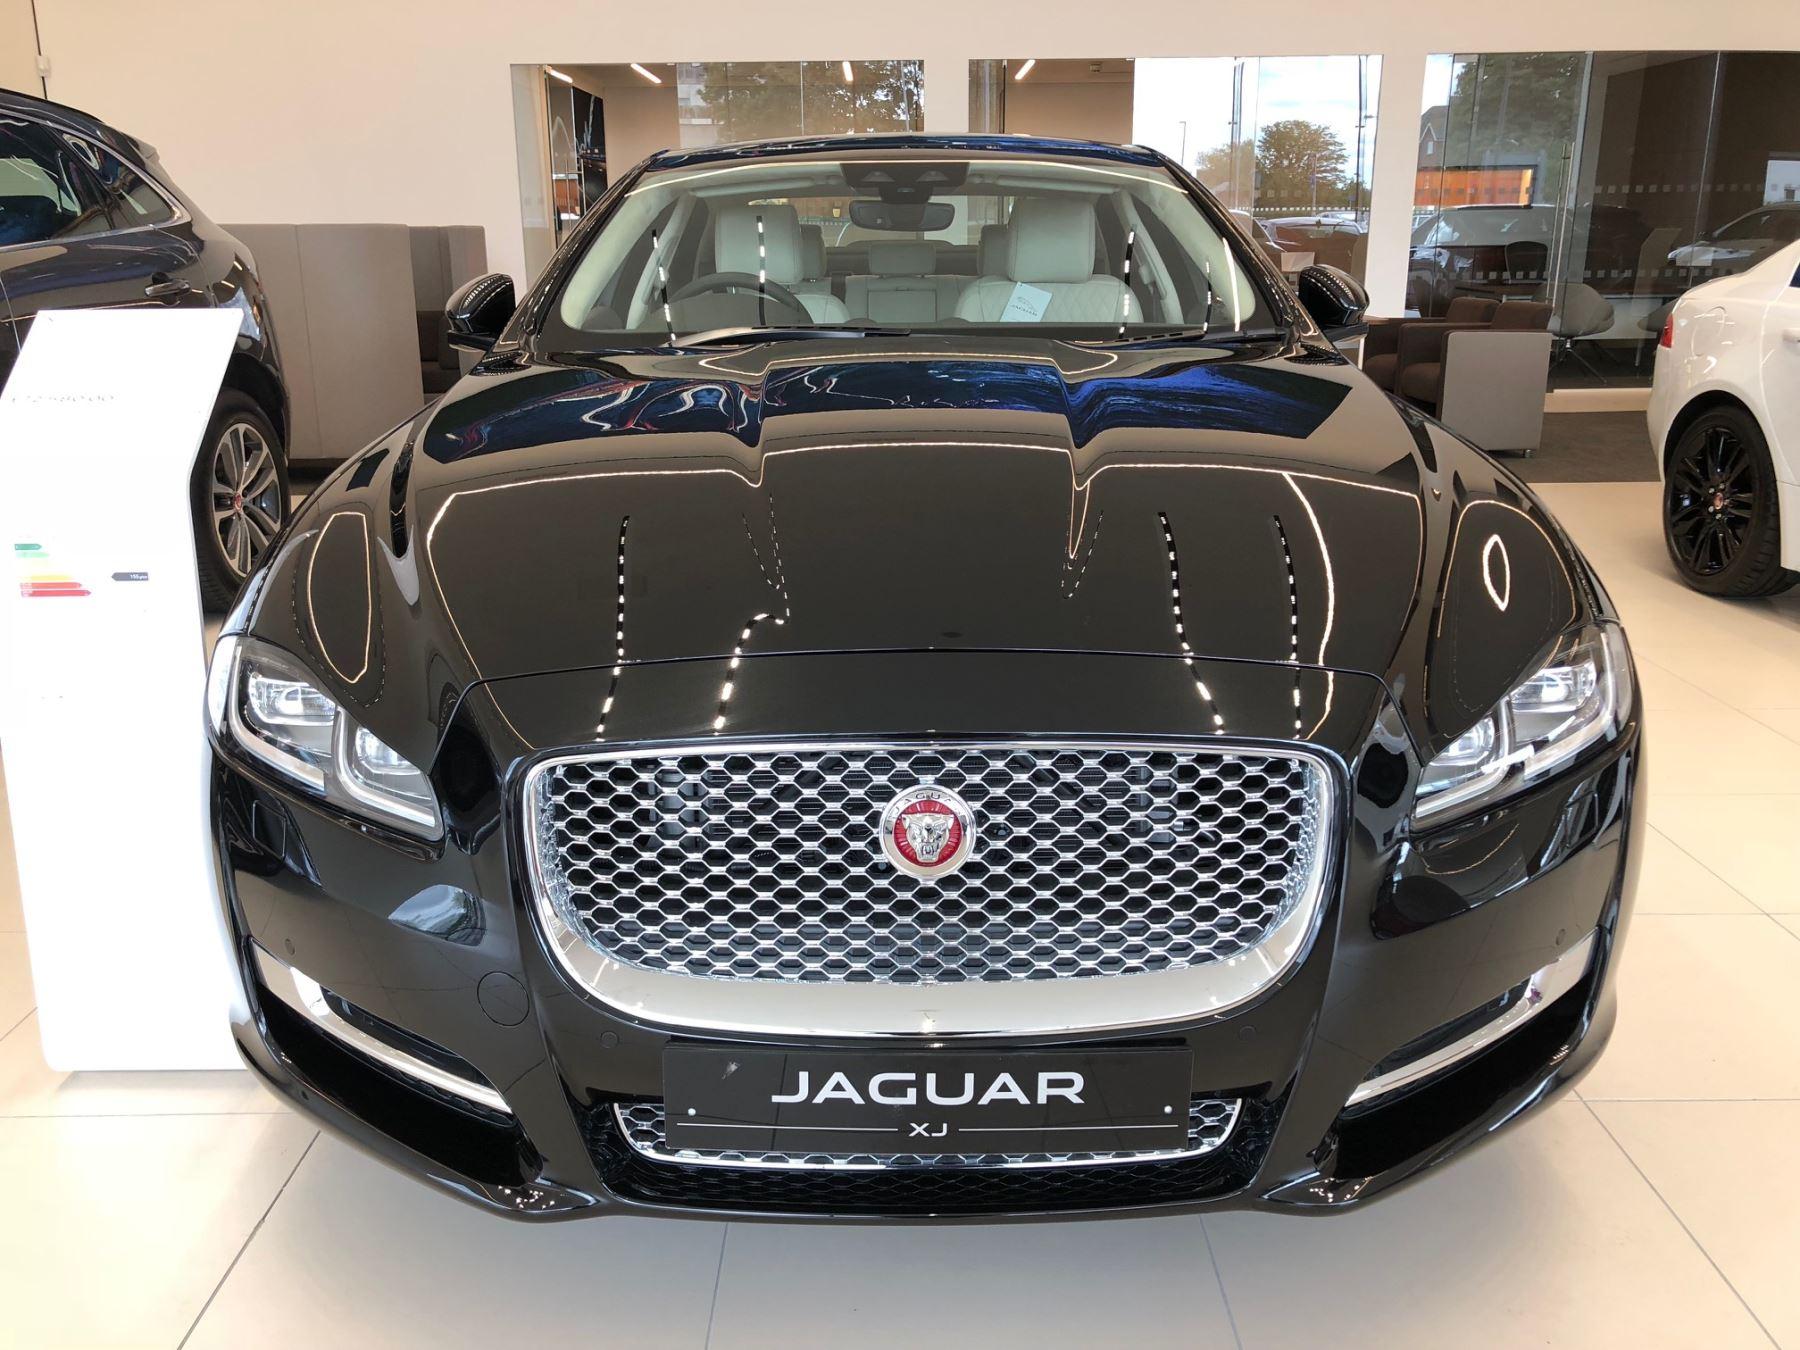 Jaguar XJ 3.0d V6 Portfolio image 2